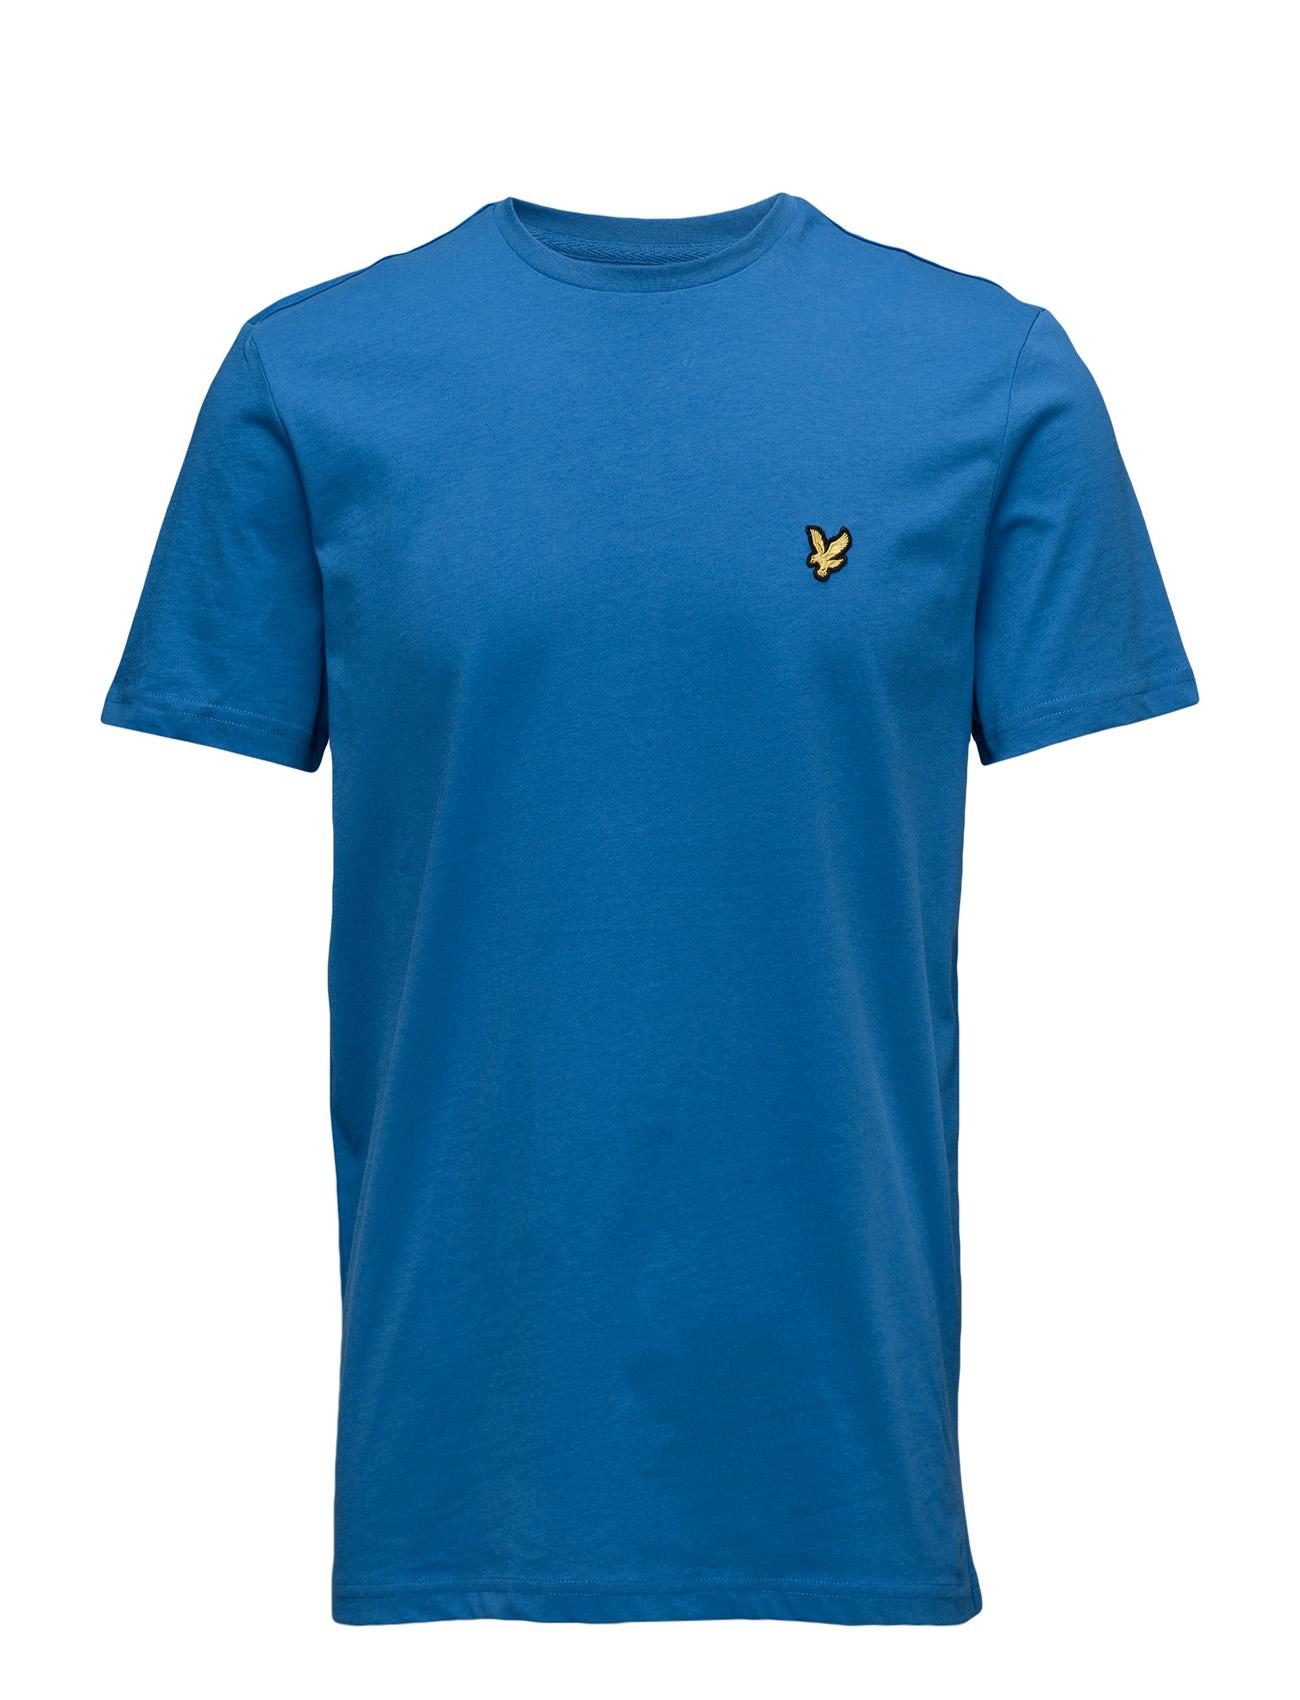 Lyle & Scott Crew Neck T-Shirt - LAKE BLUE